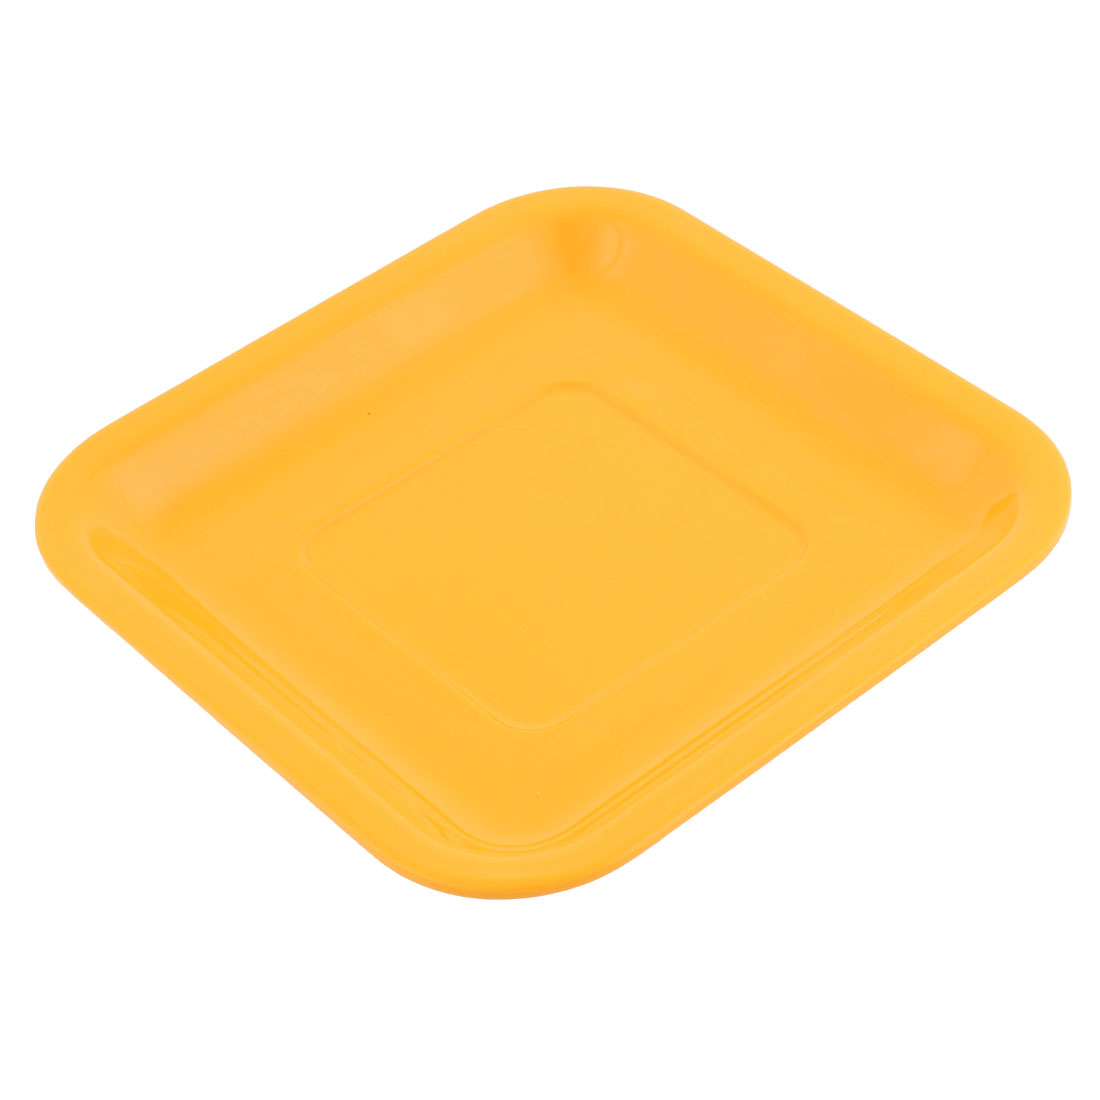 Square Design Dinner Dessert Vermicelli Plate Dish Container 15.5 x 15.5cm